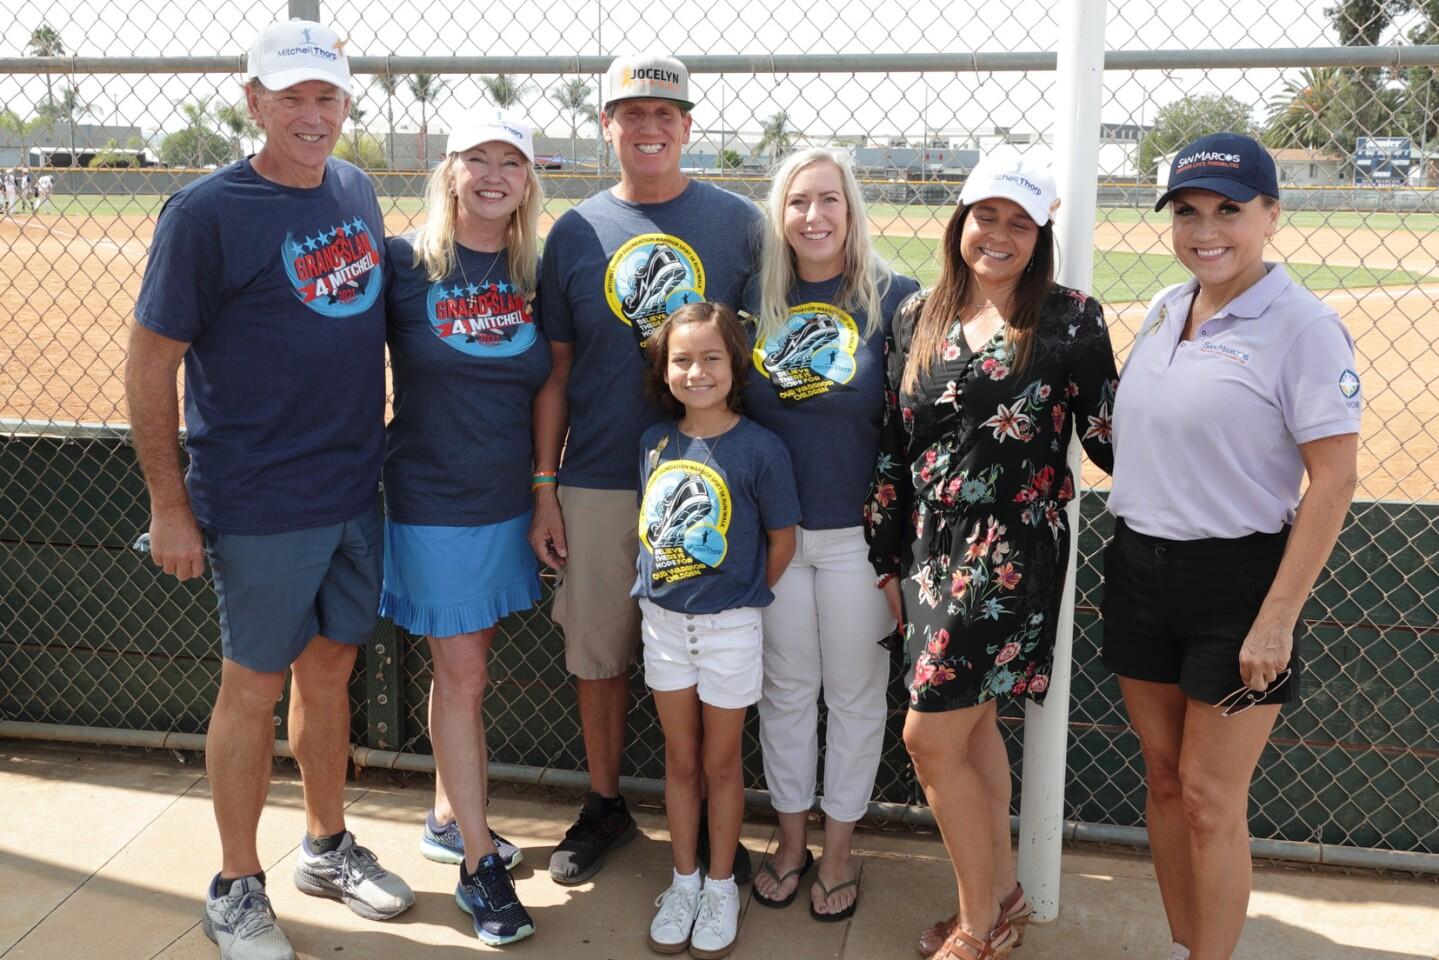 Brad and Beth Thorp (MTF co-founders); Brian, Jocelyn, and Tracy Croxen (MTF grant recipients); Kelly McLaughlin (MTF board member); Rebecca Jones (Mayor of San Marcos)